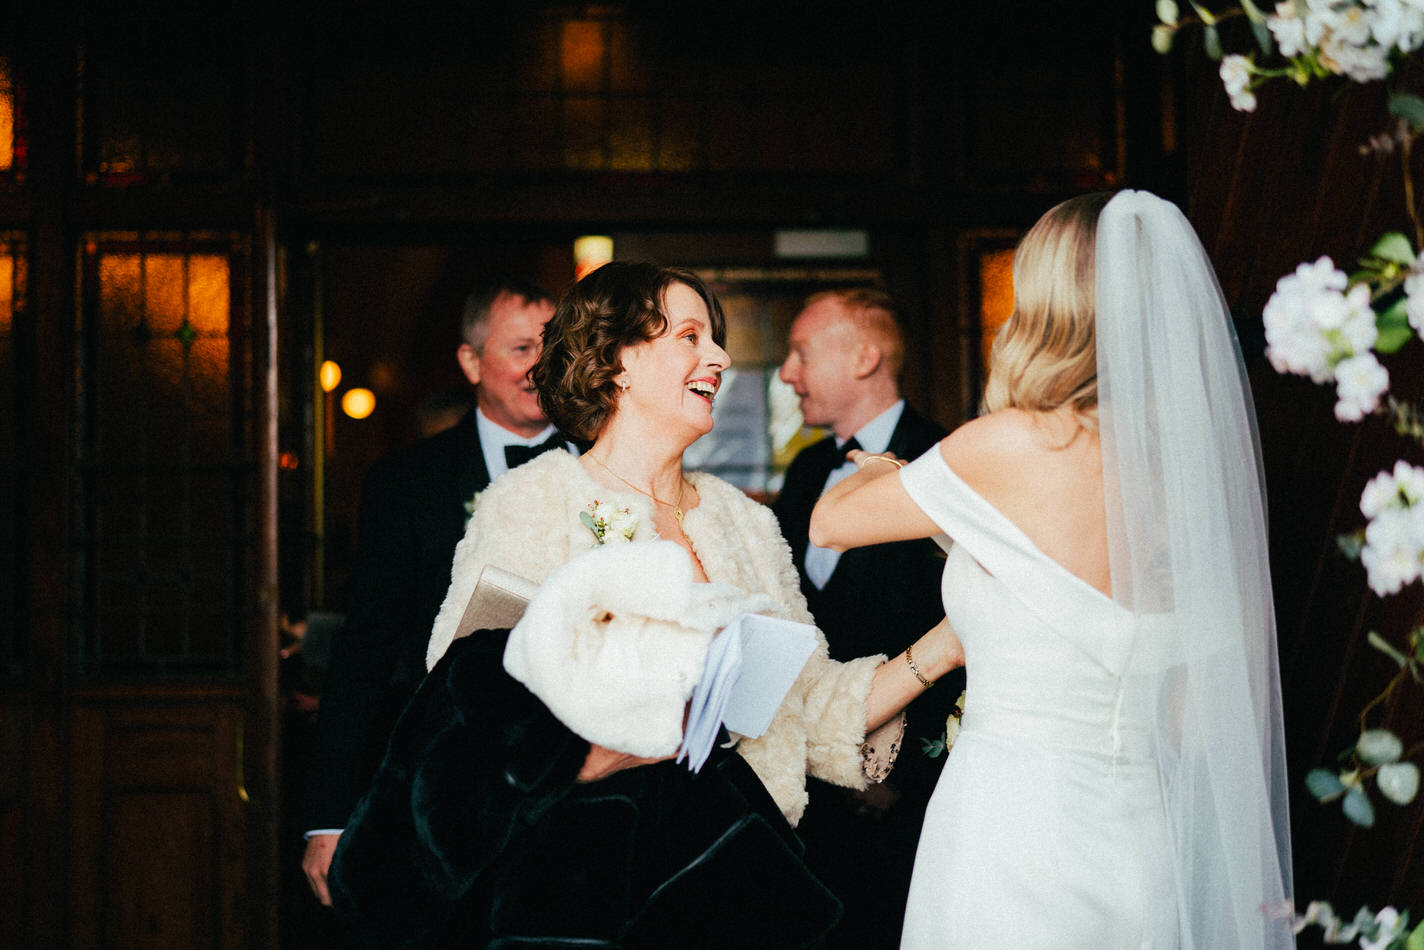 Castle-wedding-ireland-photos- 0155 107